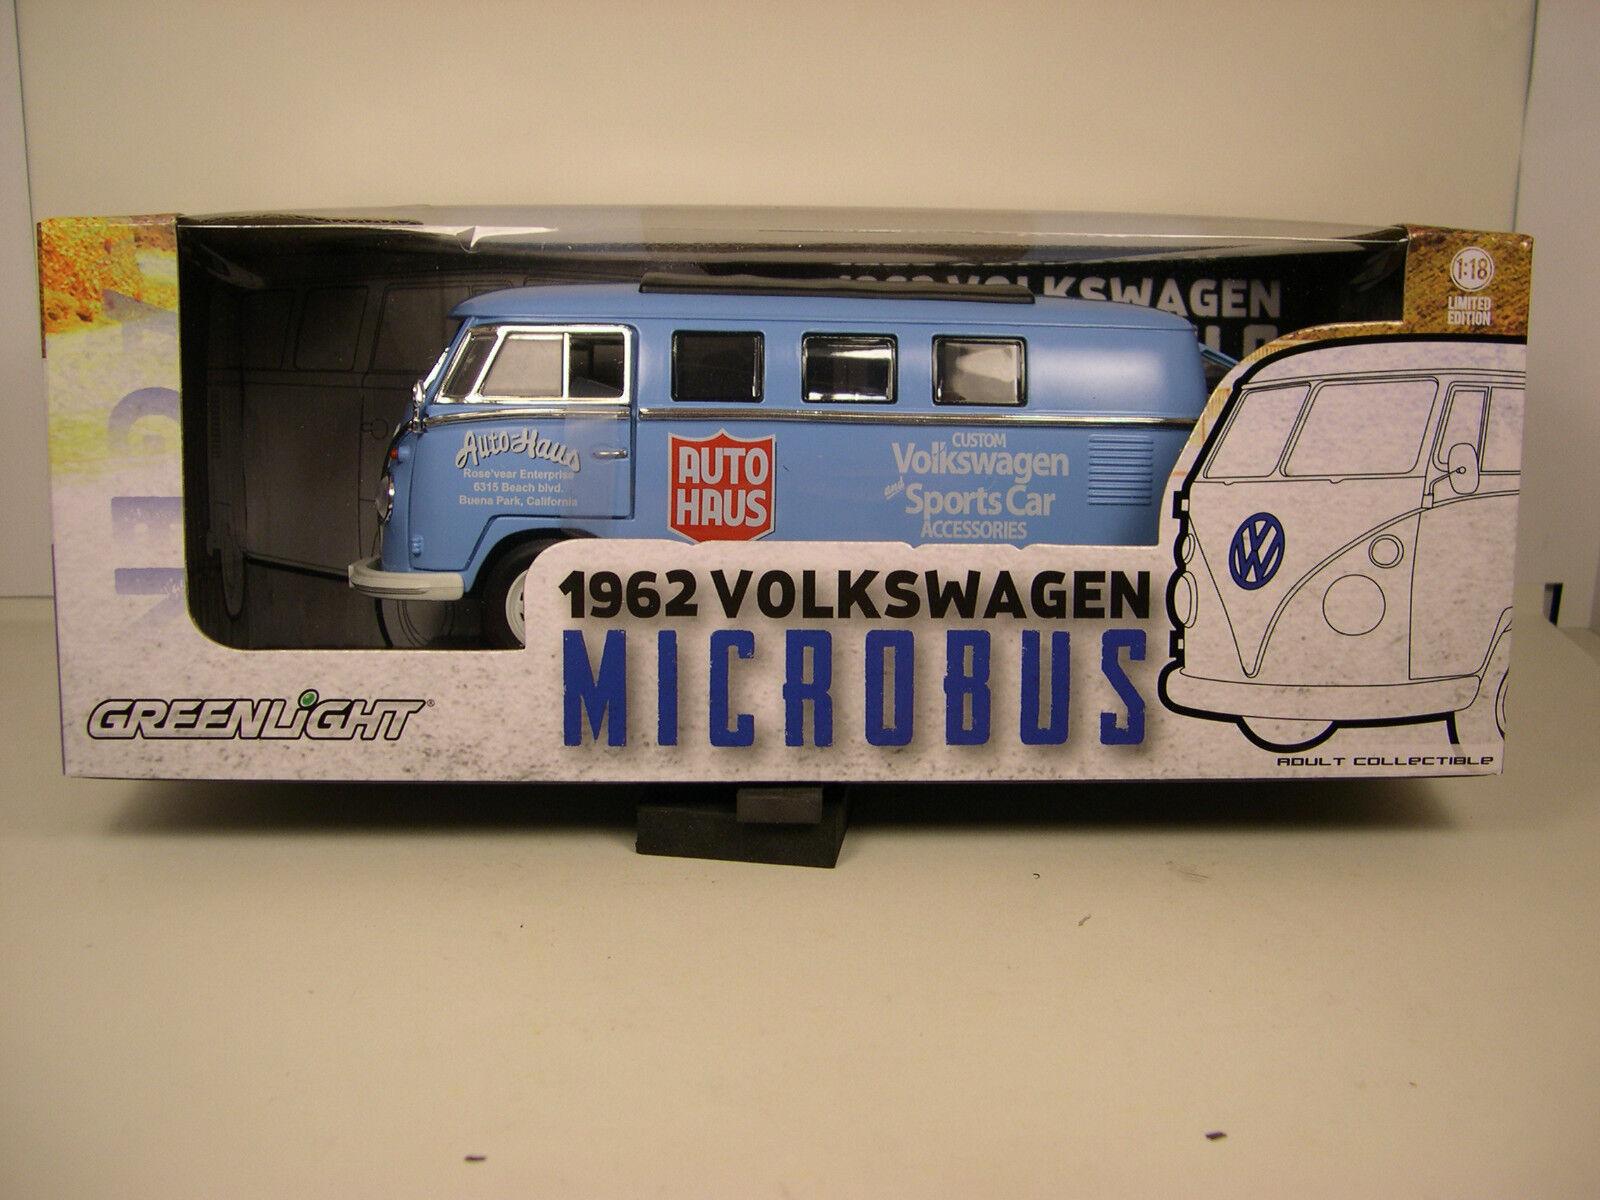 blueE 1962 VOLKSWAGEN VW MICROBUS GREENLIGHT 1 18 SCALE DIECAST METAL MODEL